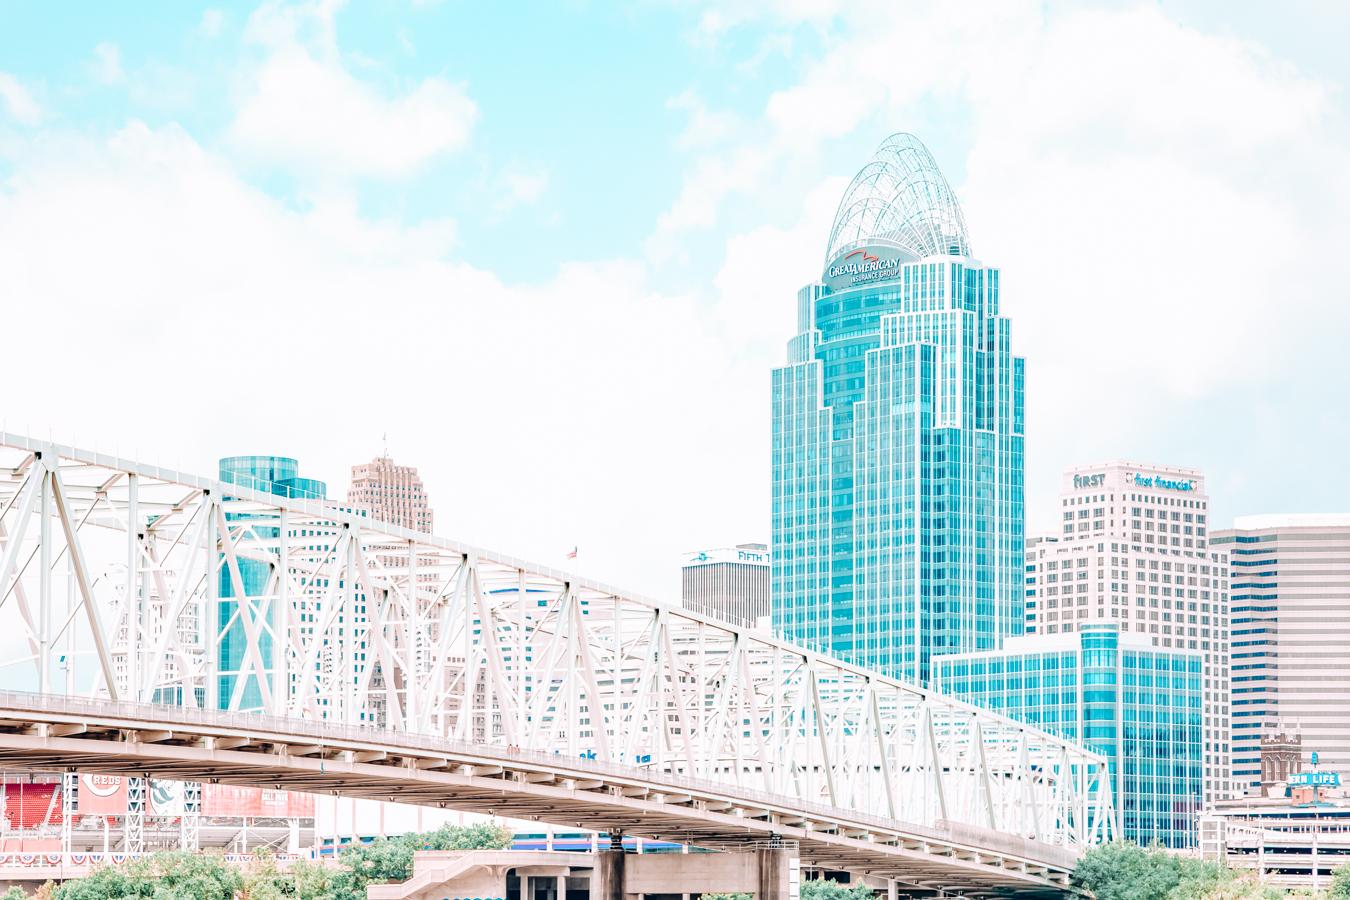 Bridge and buildings in Cincinnati